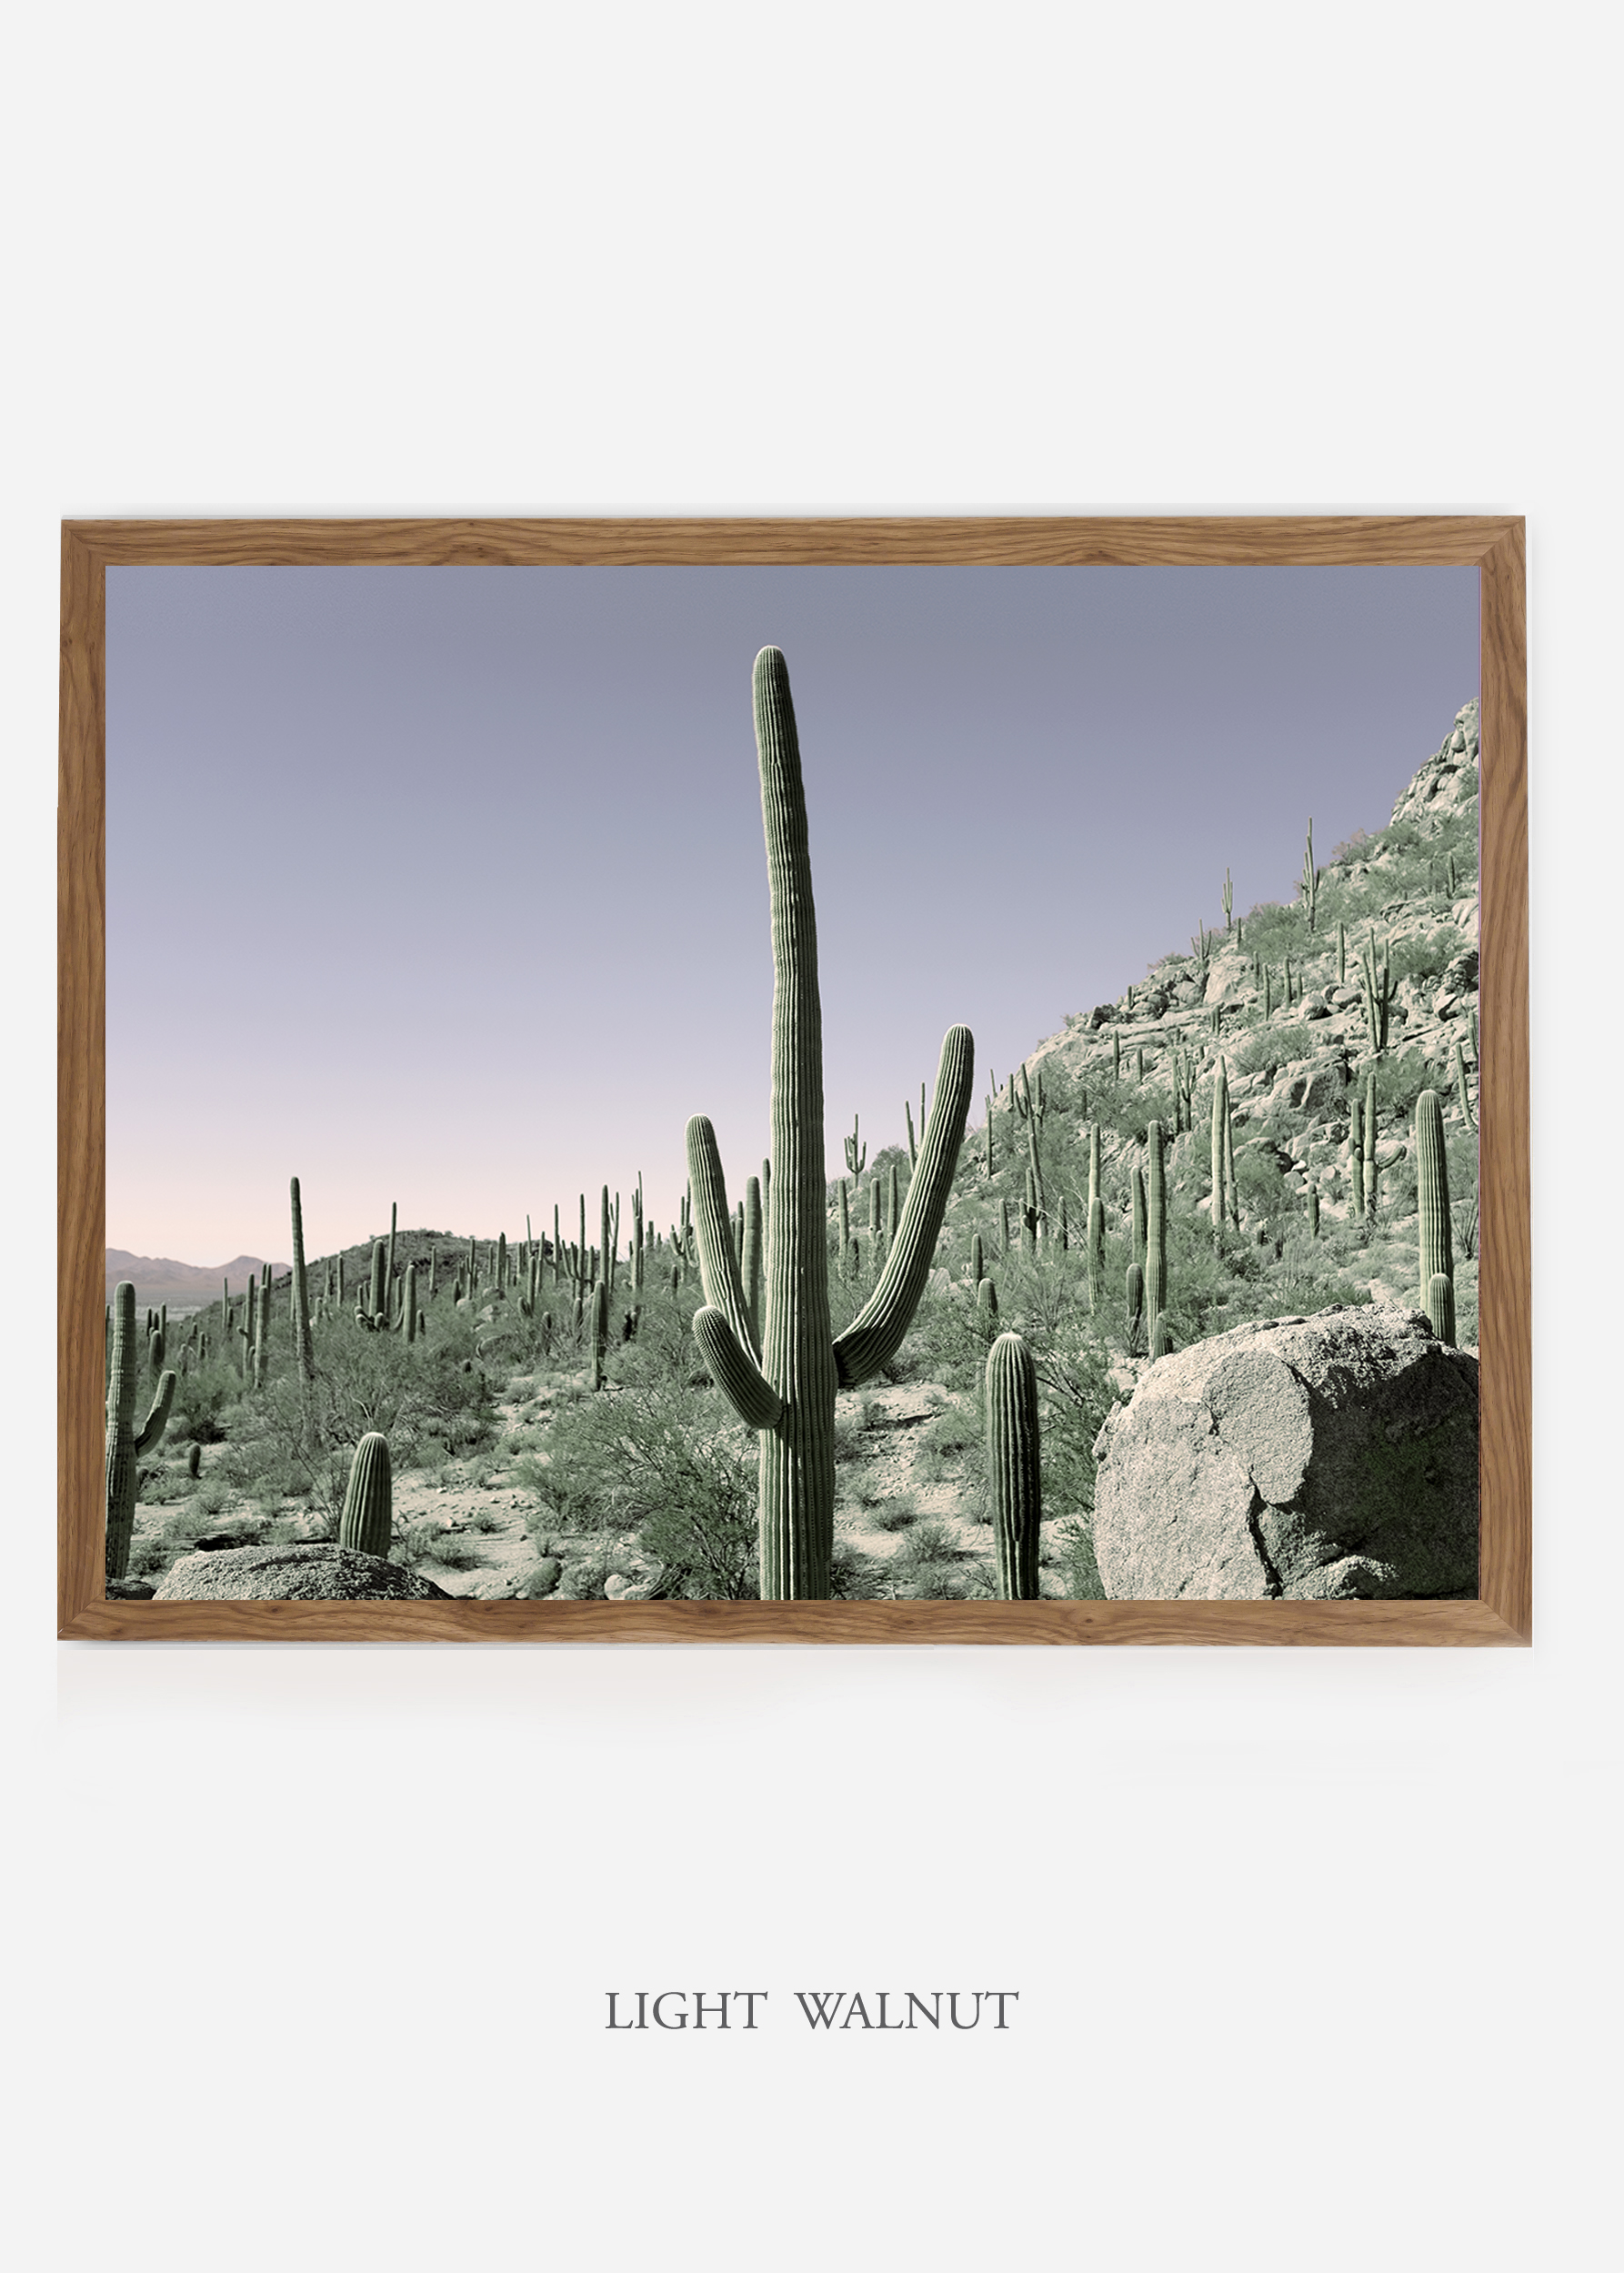 nomat_lightwalnutframe-saguaroNo.13-wildercalifornia-art-wallart-cactusprint-homedecor-prints-arizona-botanical-artwork-interiordesign.jpg